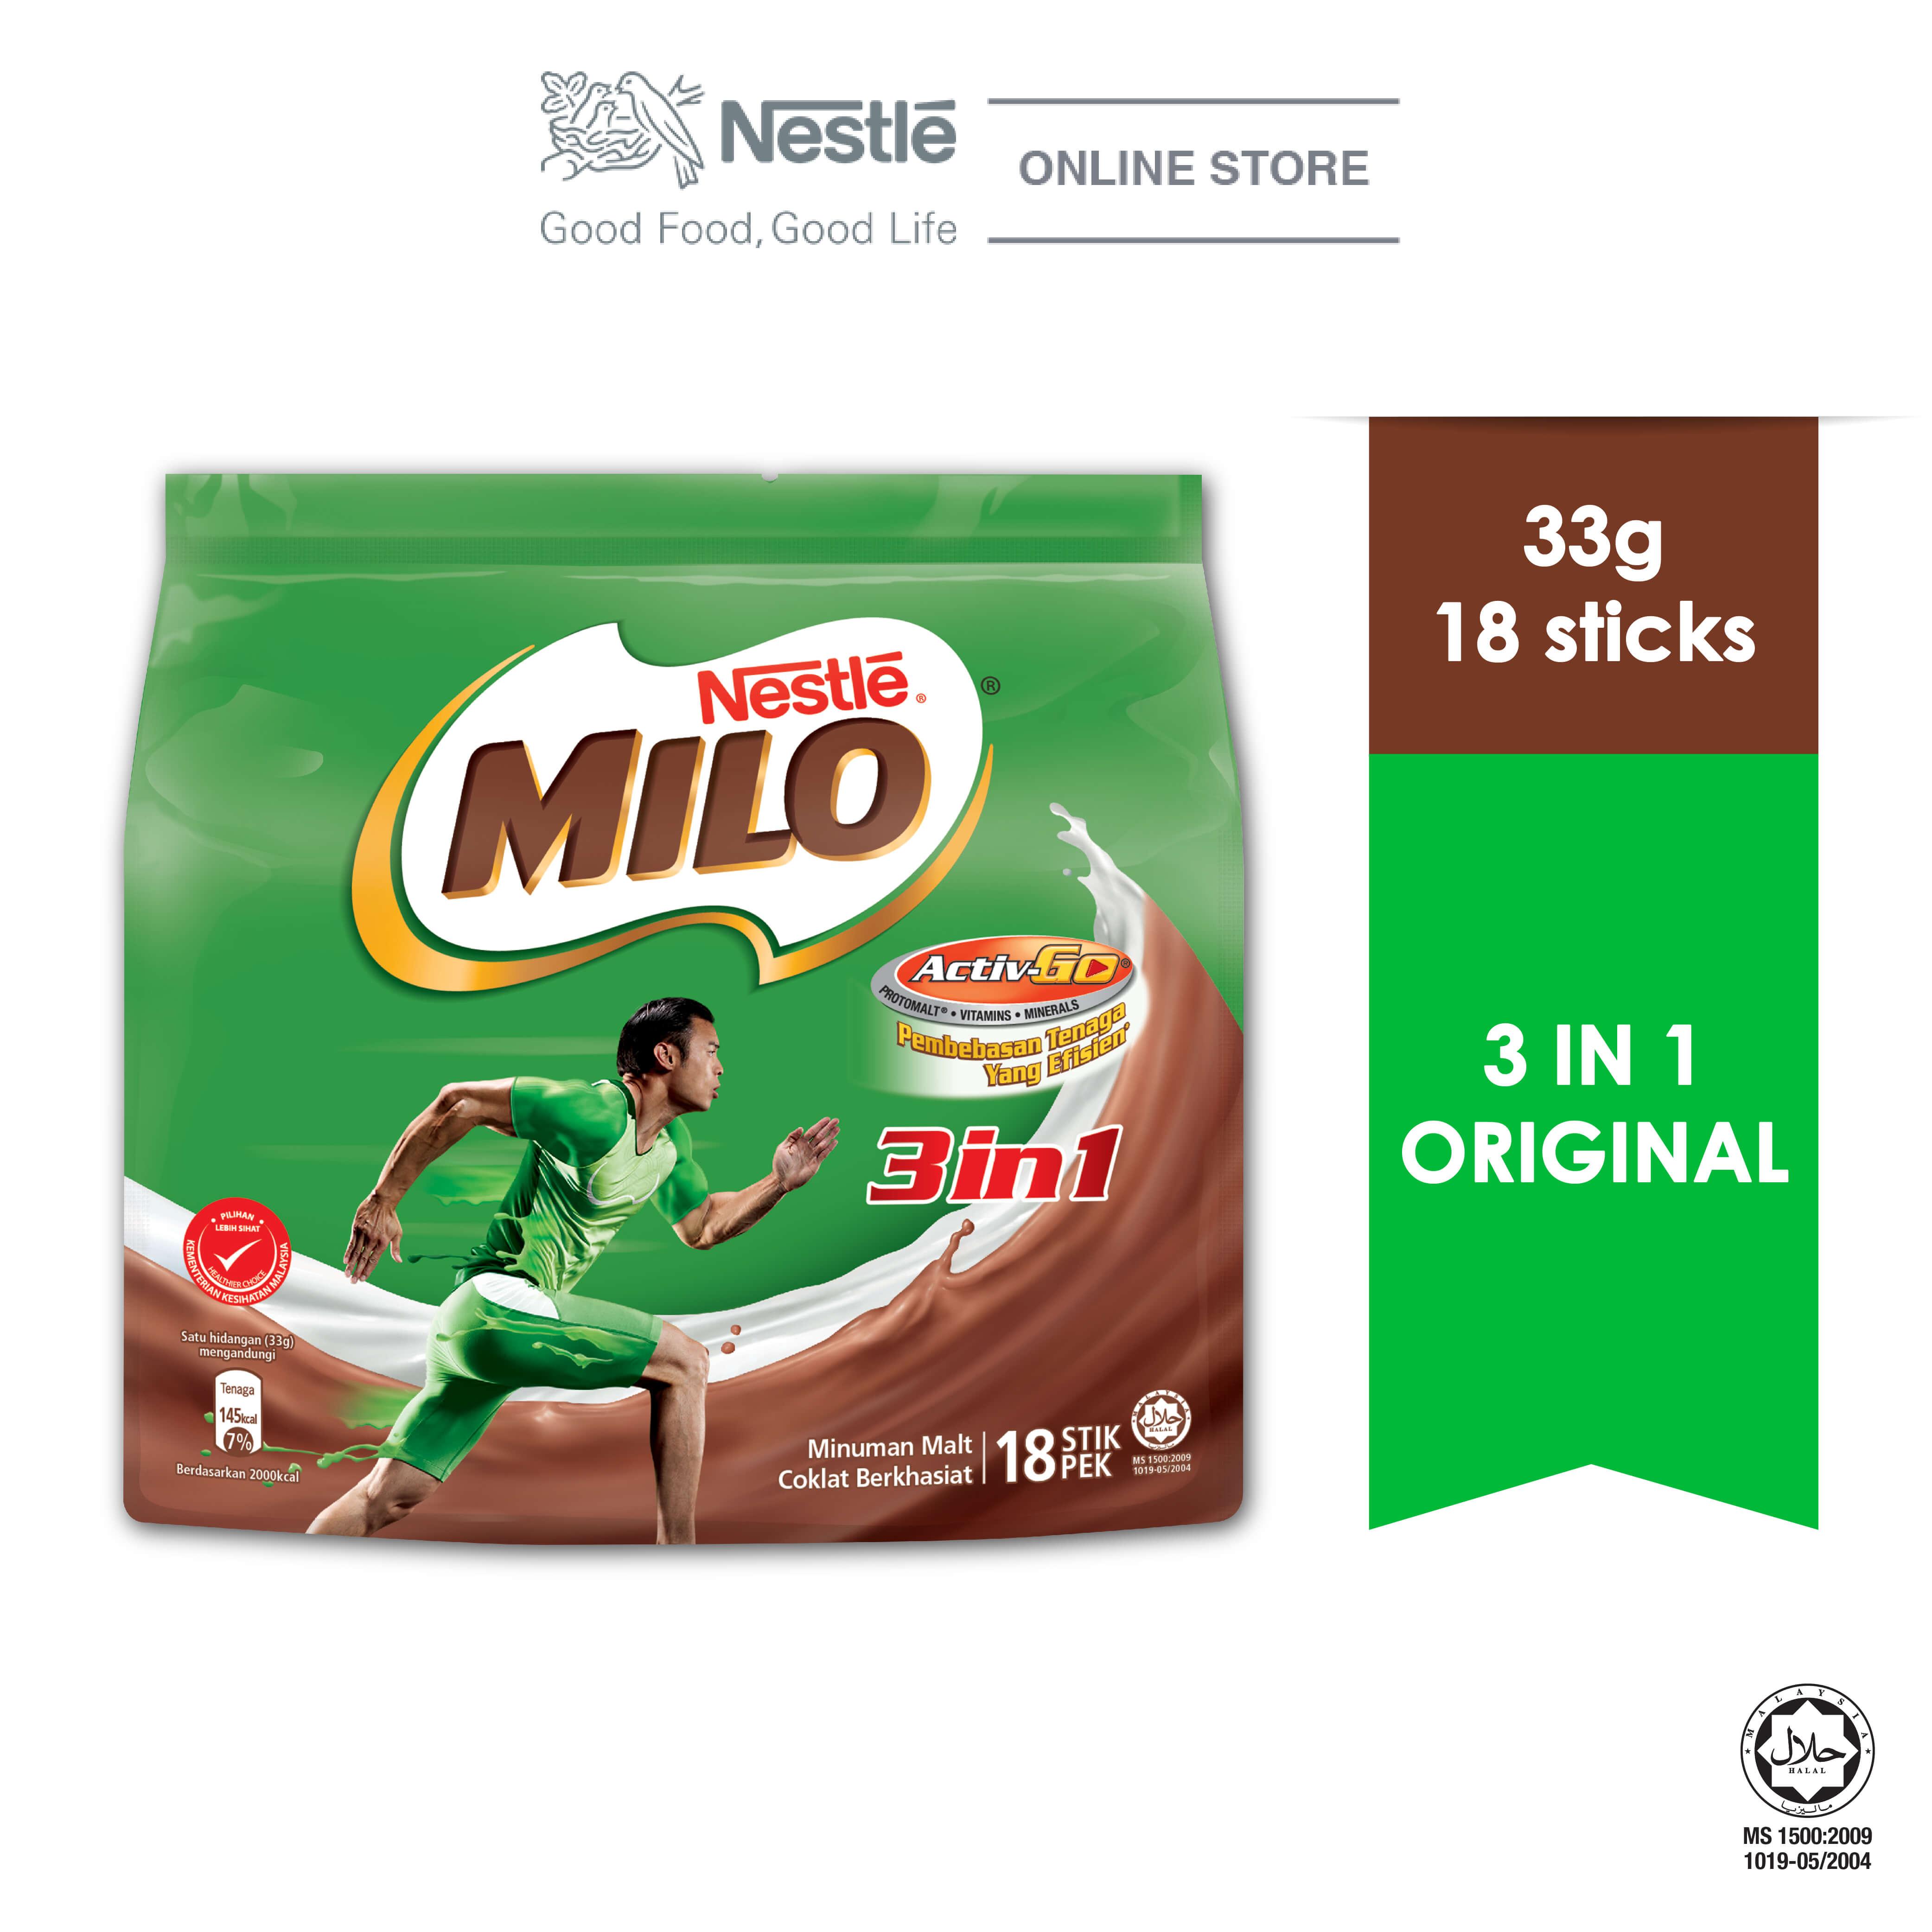 NESTLE MILO 3IN1 ACTIV-GO 18 Sticks 33g